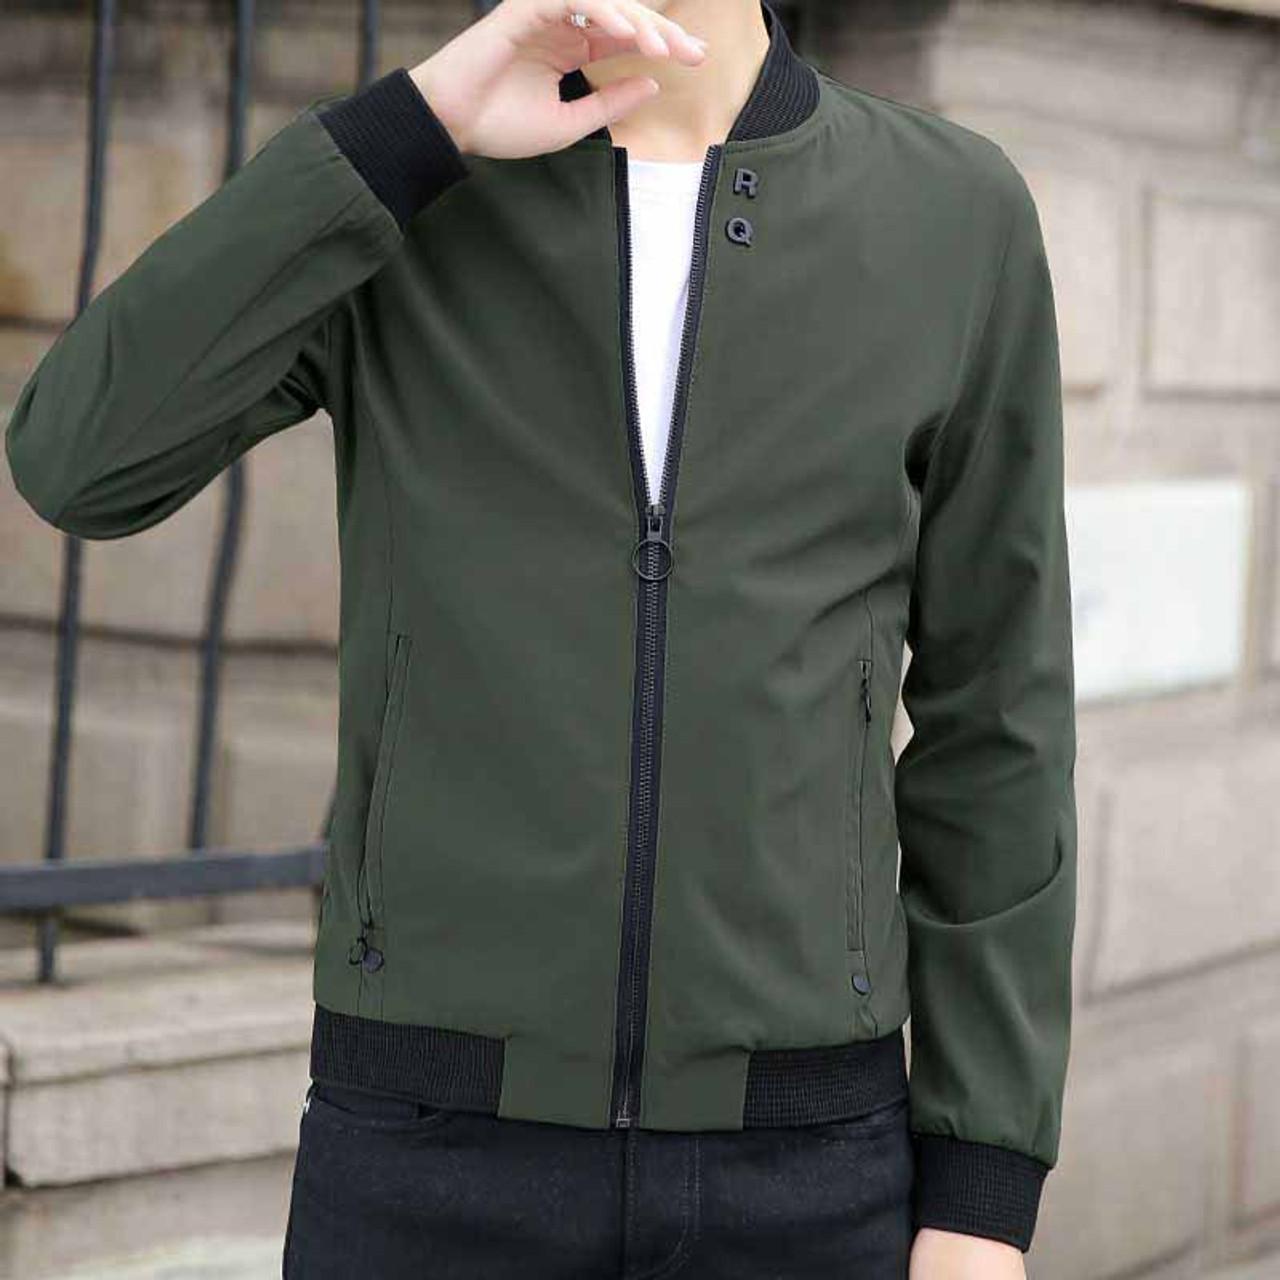 Shop Online for Winter Jackets and Coats for Men at Koovs